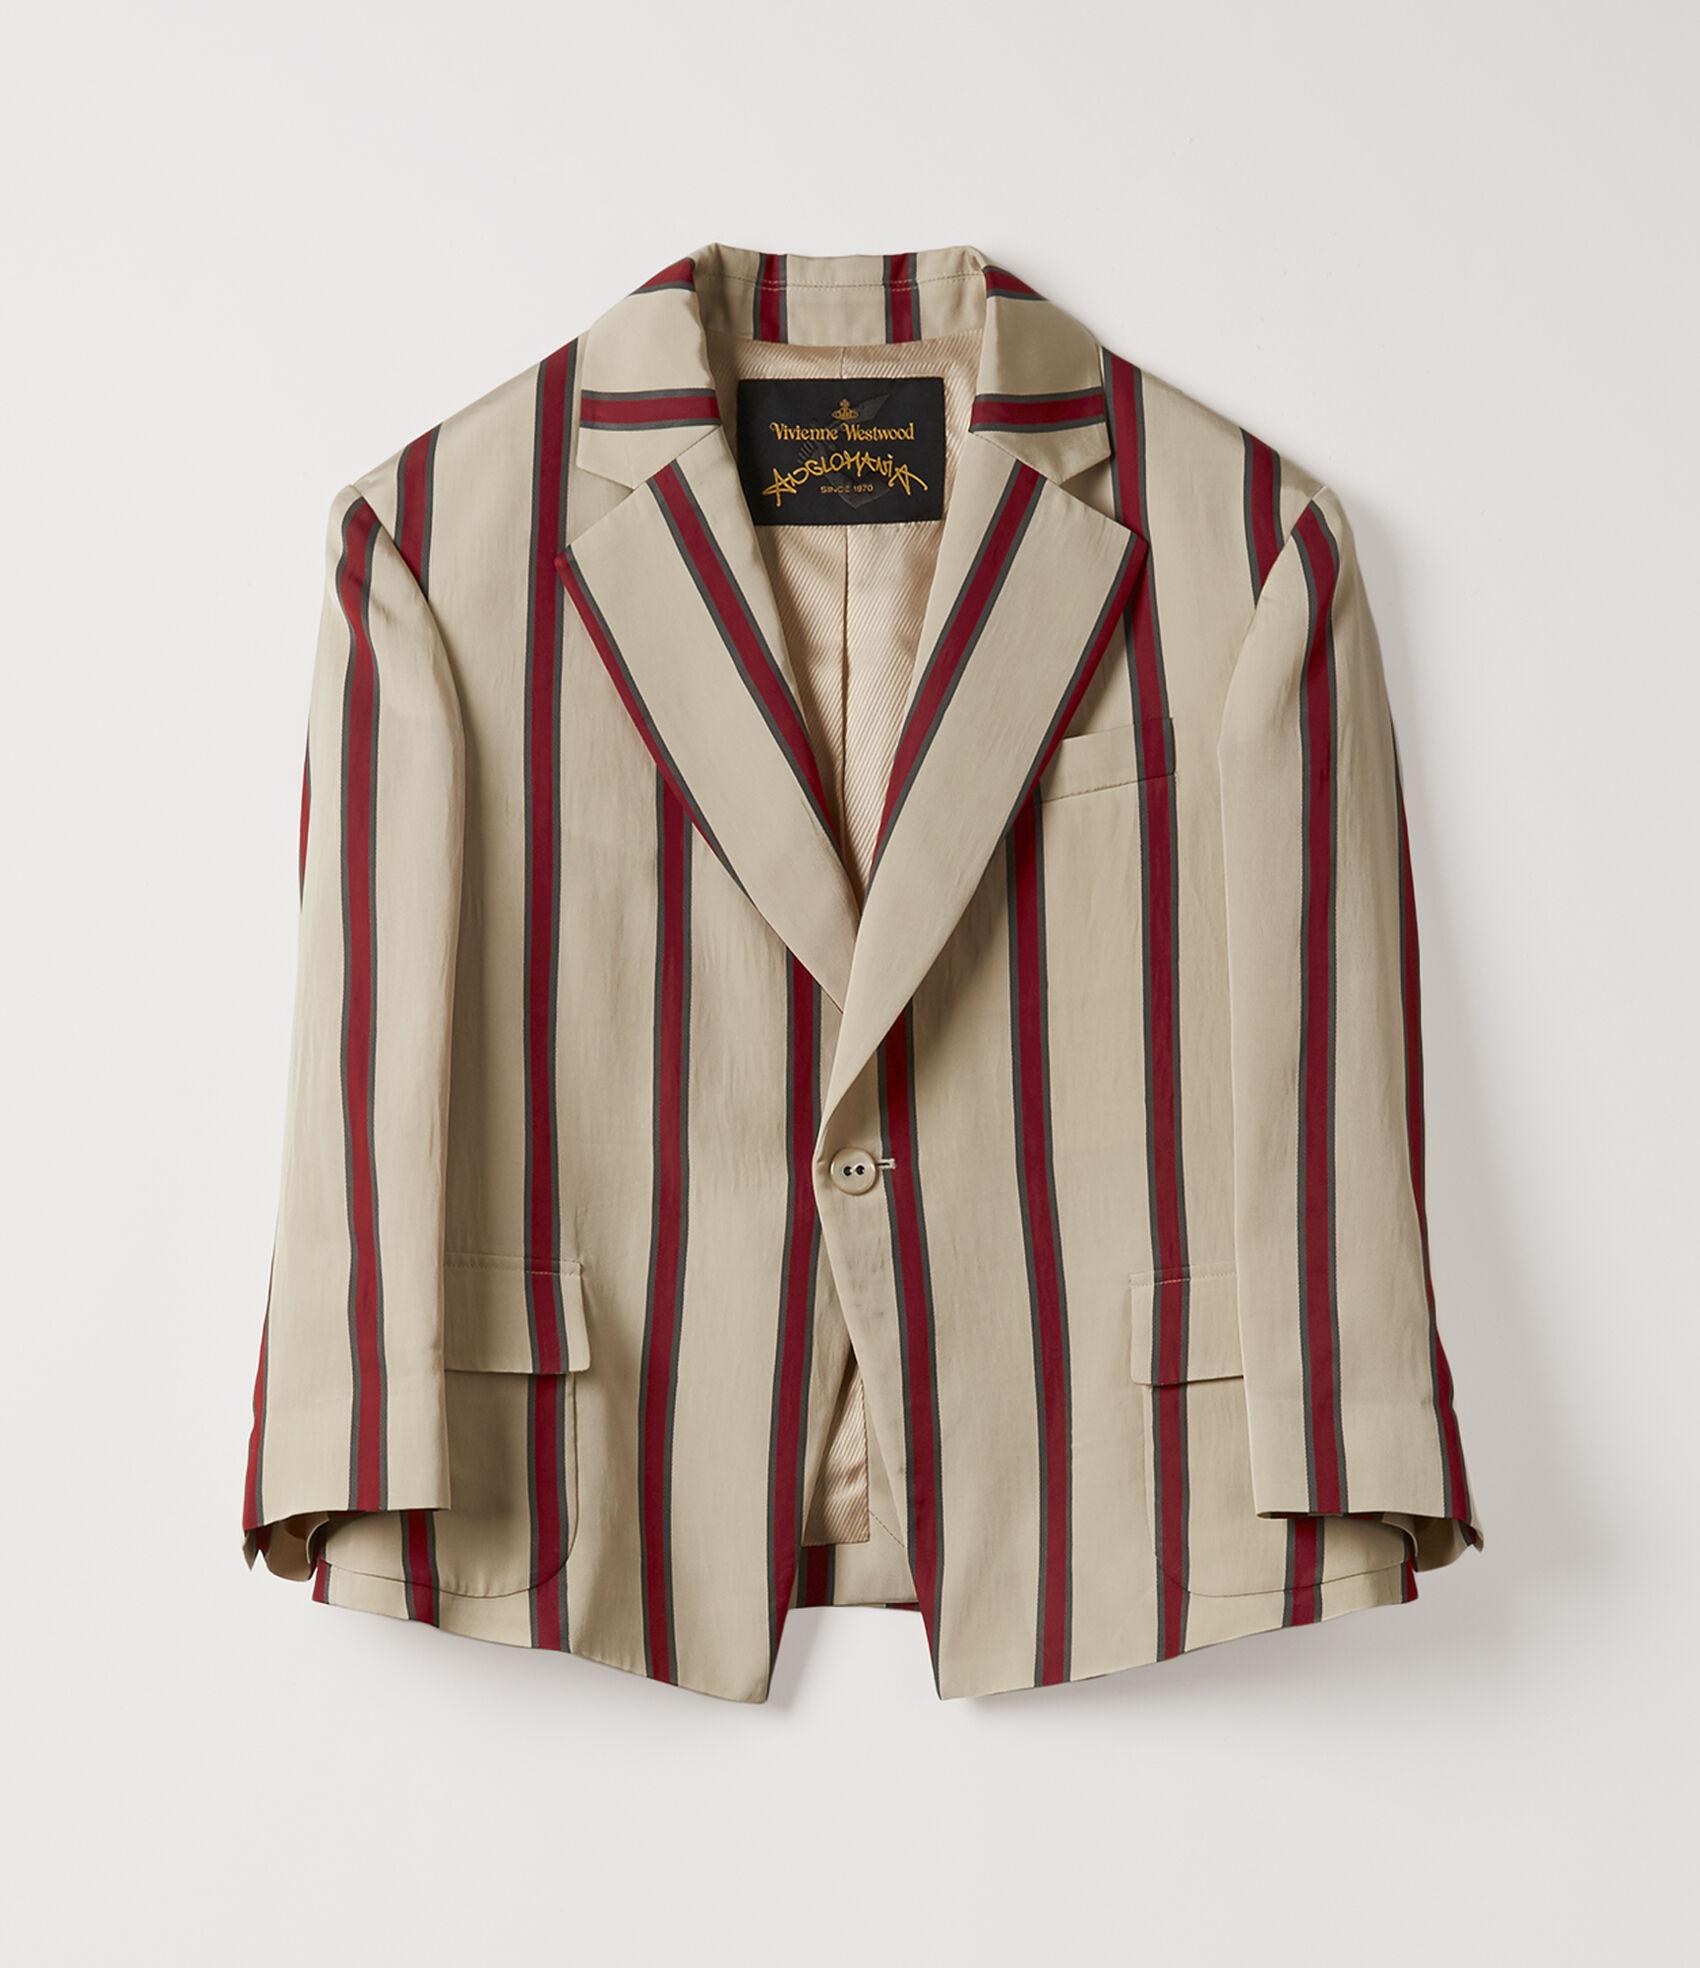 Prince Jacket in Cream from Vivienne Westwood